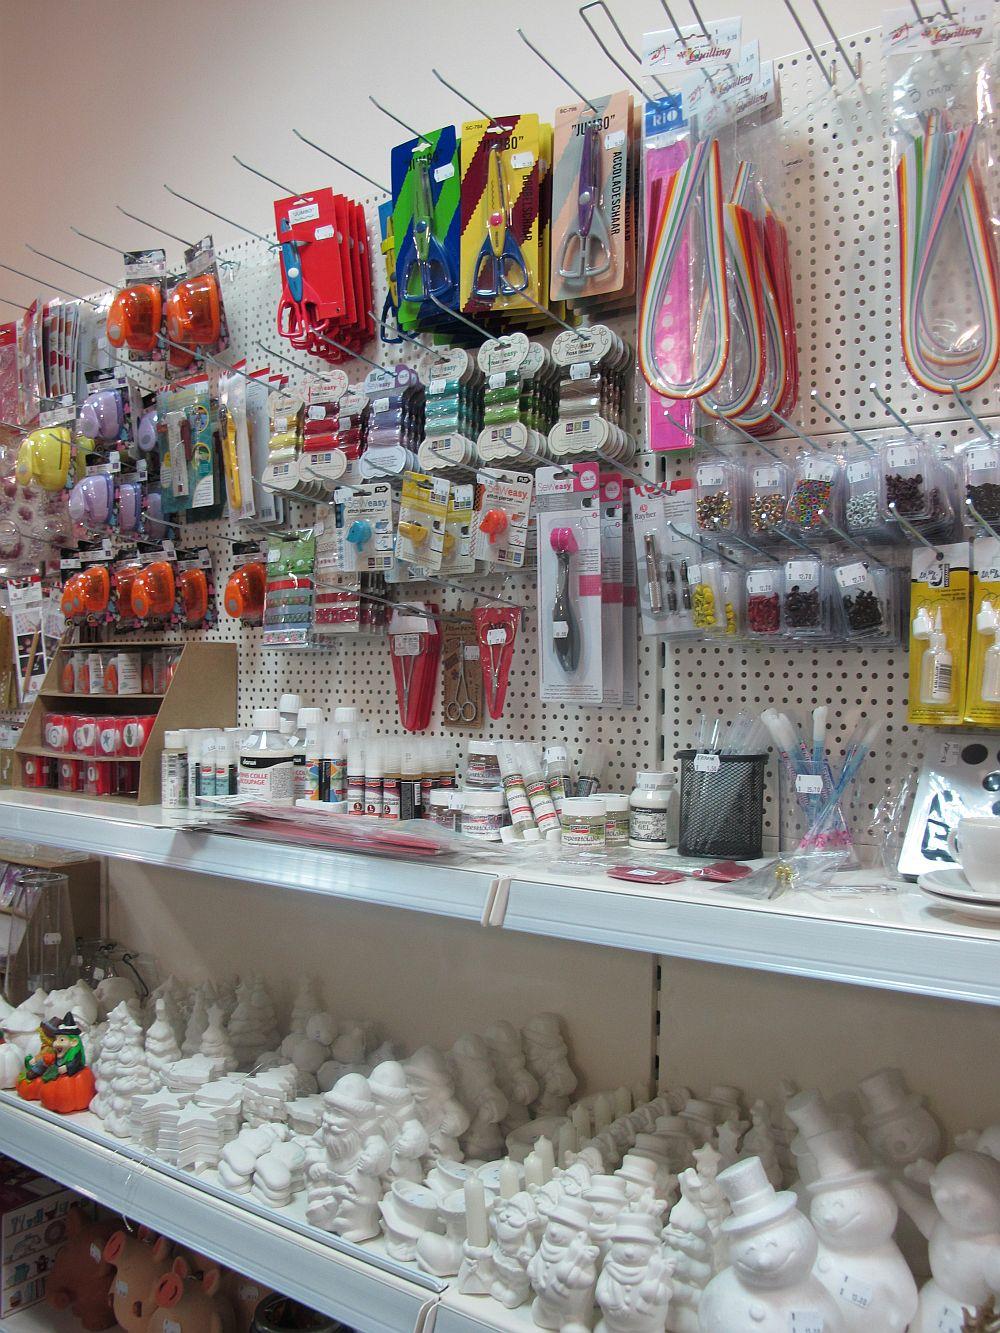 adelaparvu.com about Colorit new art&crafts shop in Bucharest (7)